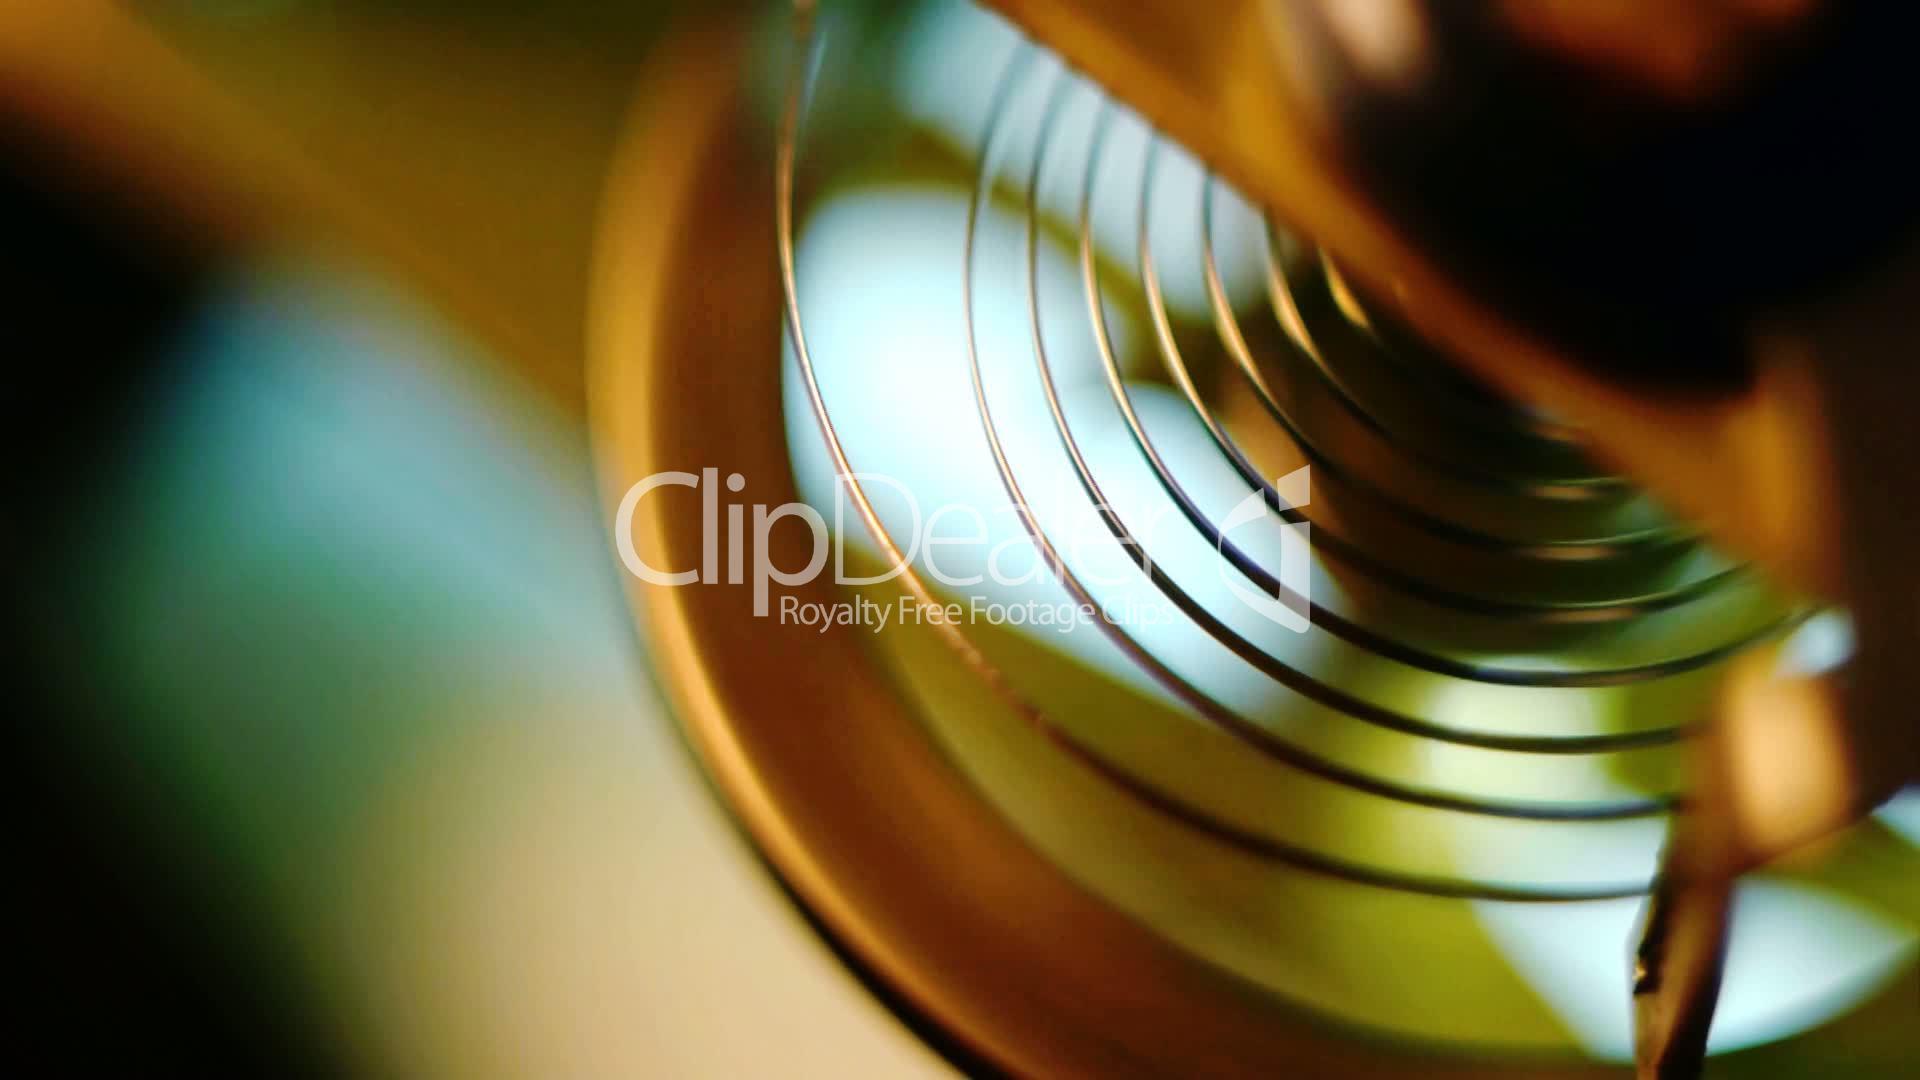 Pendulum clock mechanism: Royalty-free video and stock footage